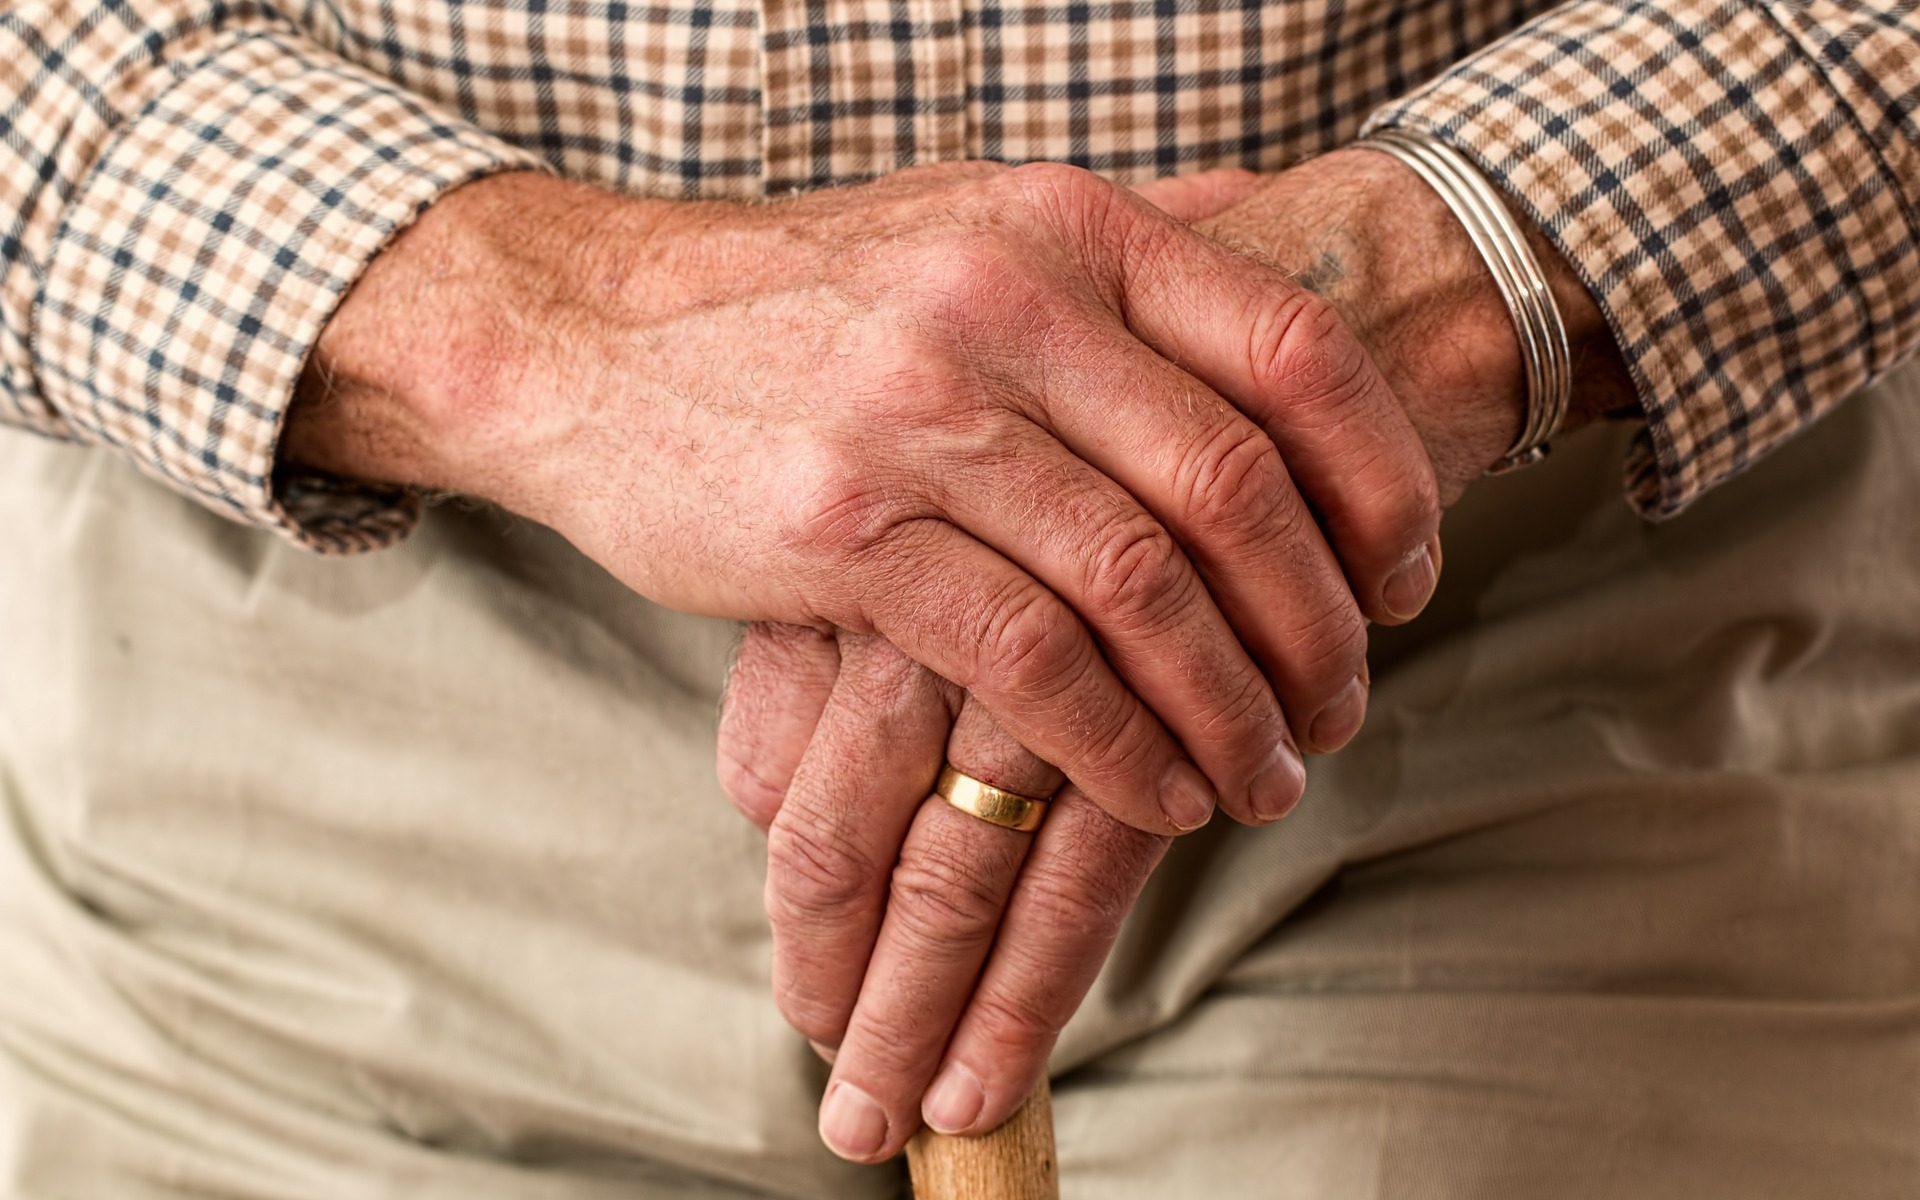 Sex im Alter - heute schon an morgen denken auf men-styling.de